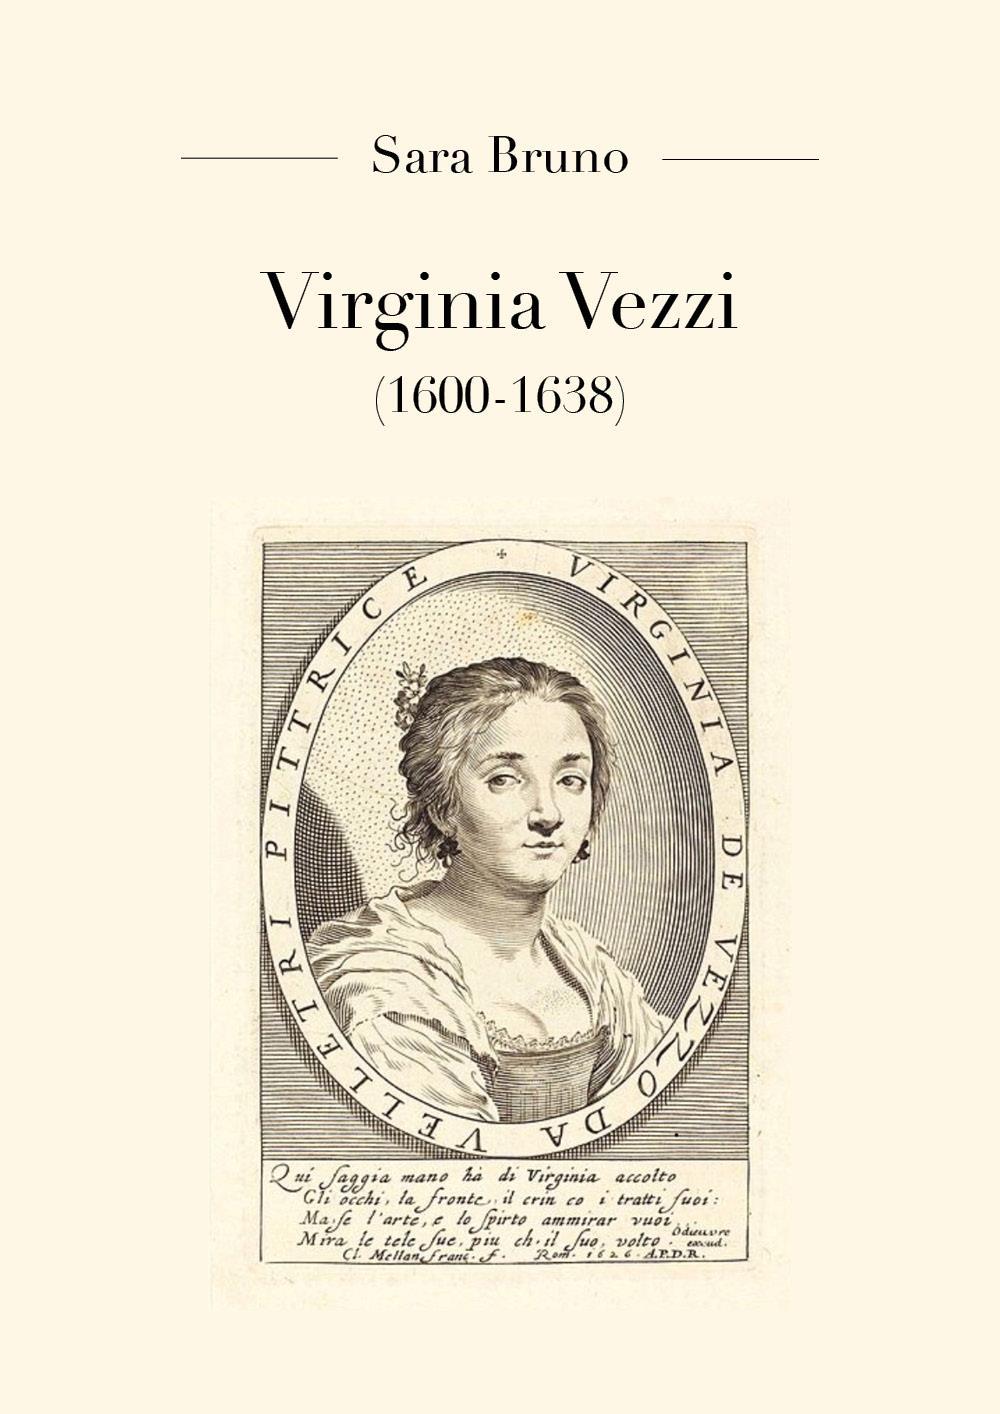 Virginia Vezzi (1600-1638)